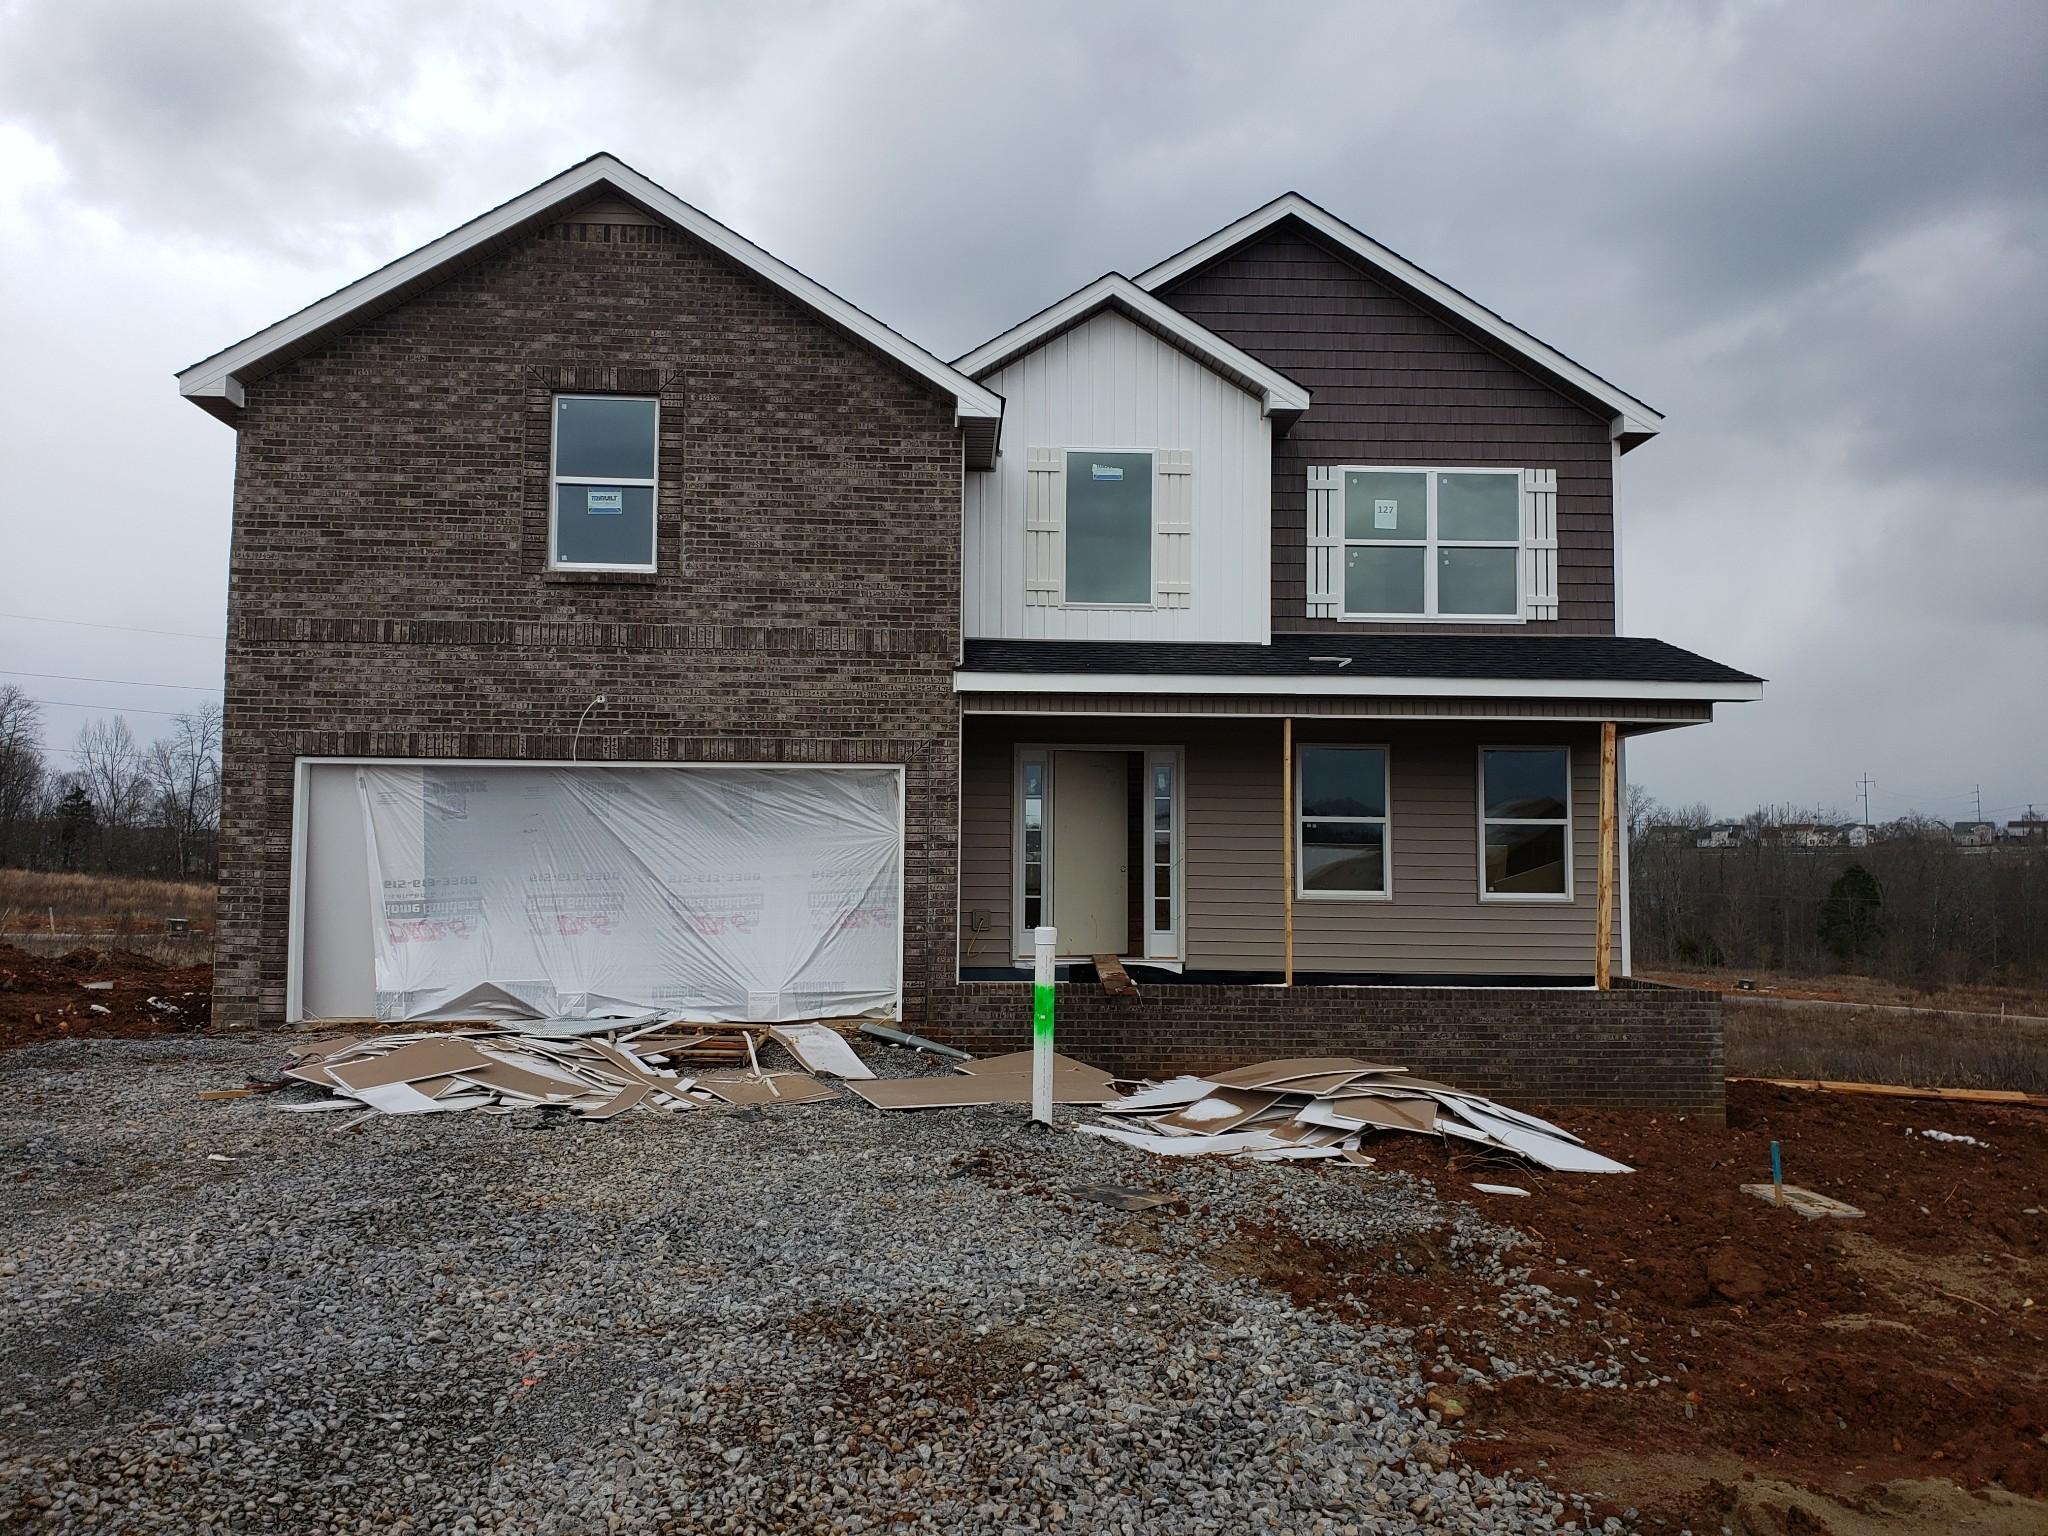 776 Crestone Ln (lot 127), Clarksville, TN 37042 - Clarksville, TN real estate listing